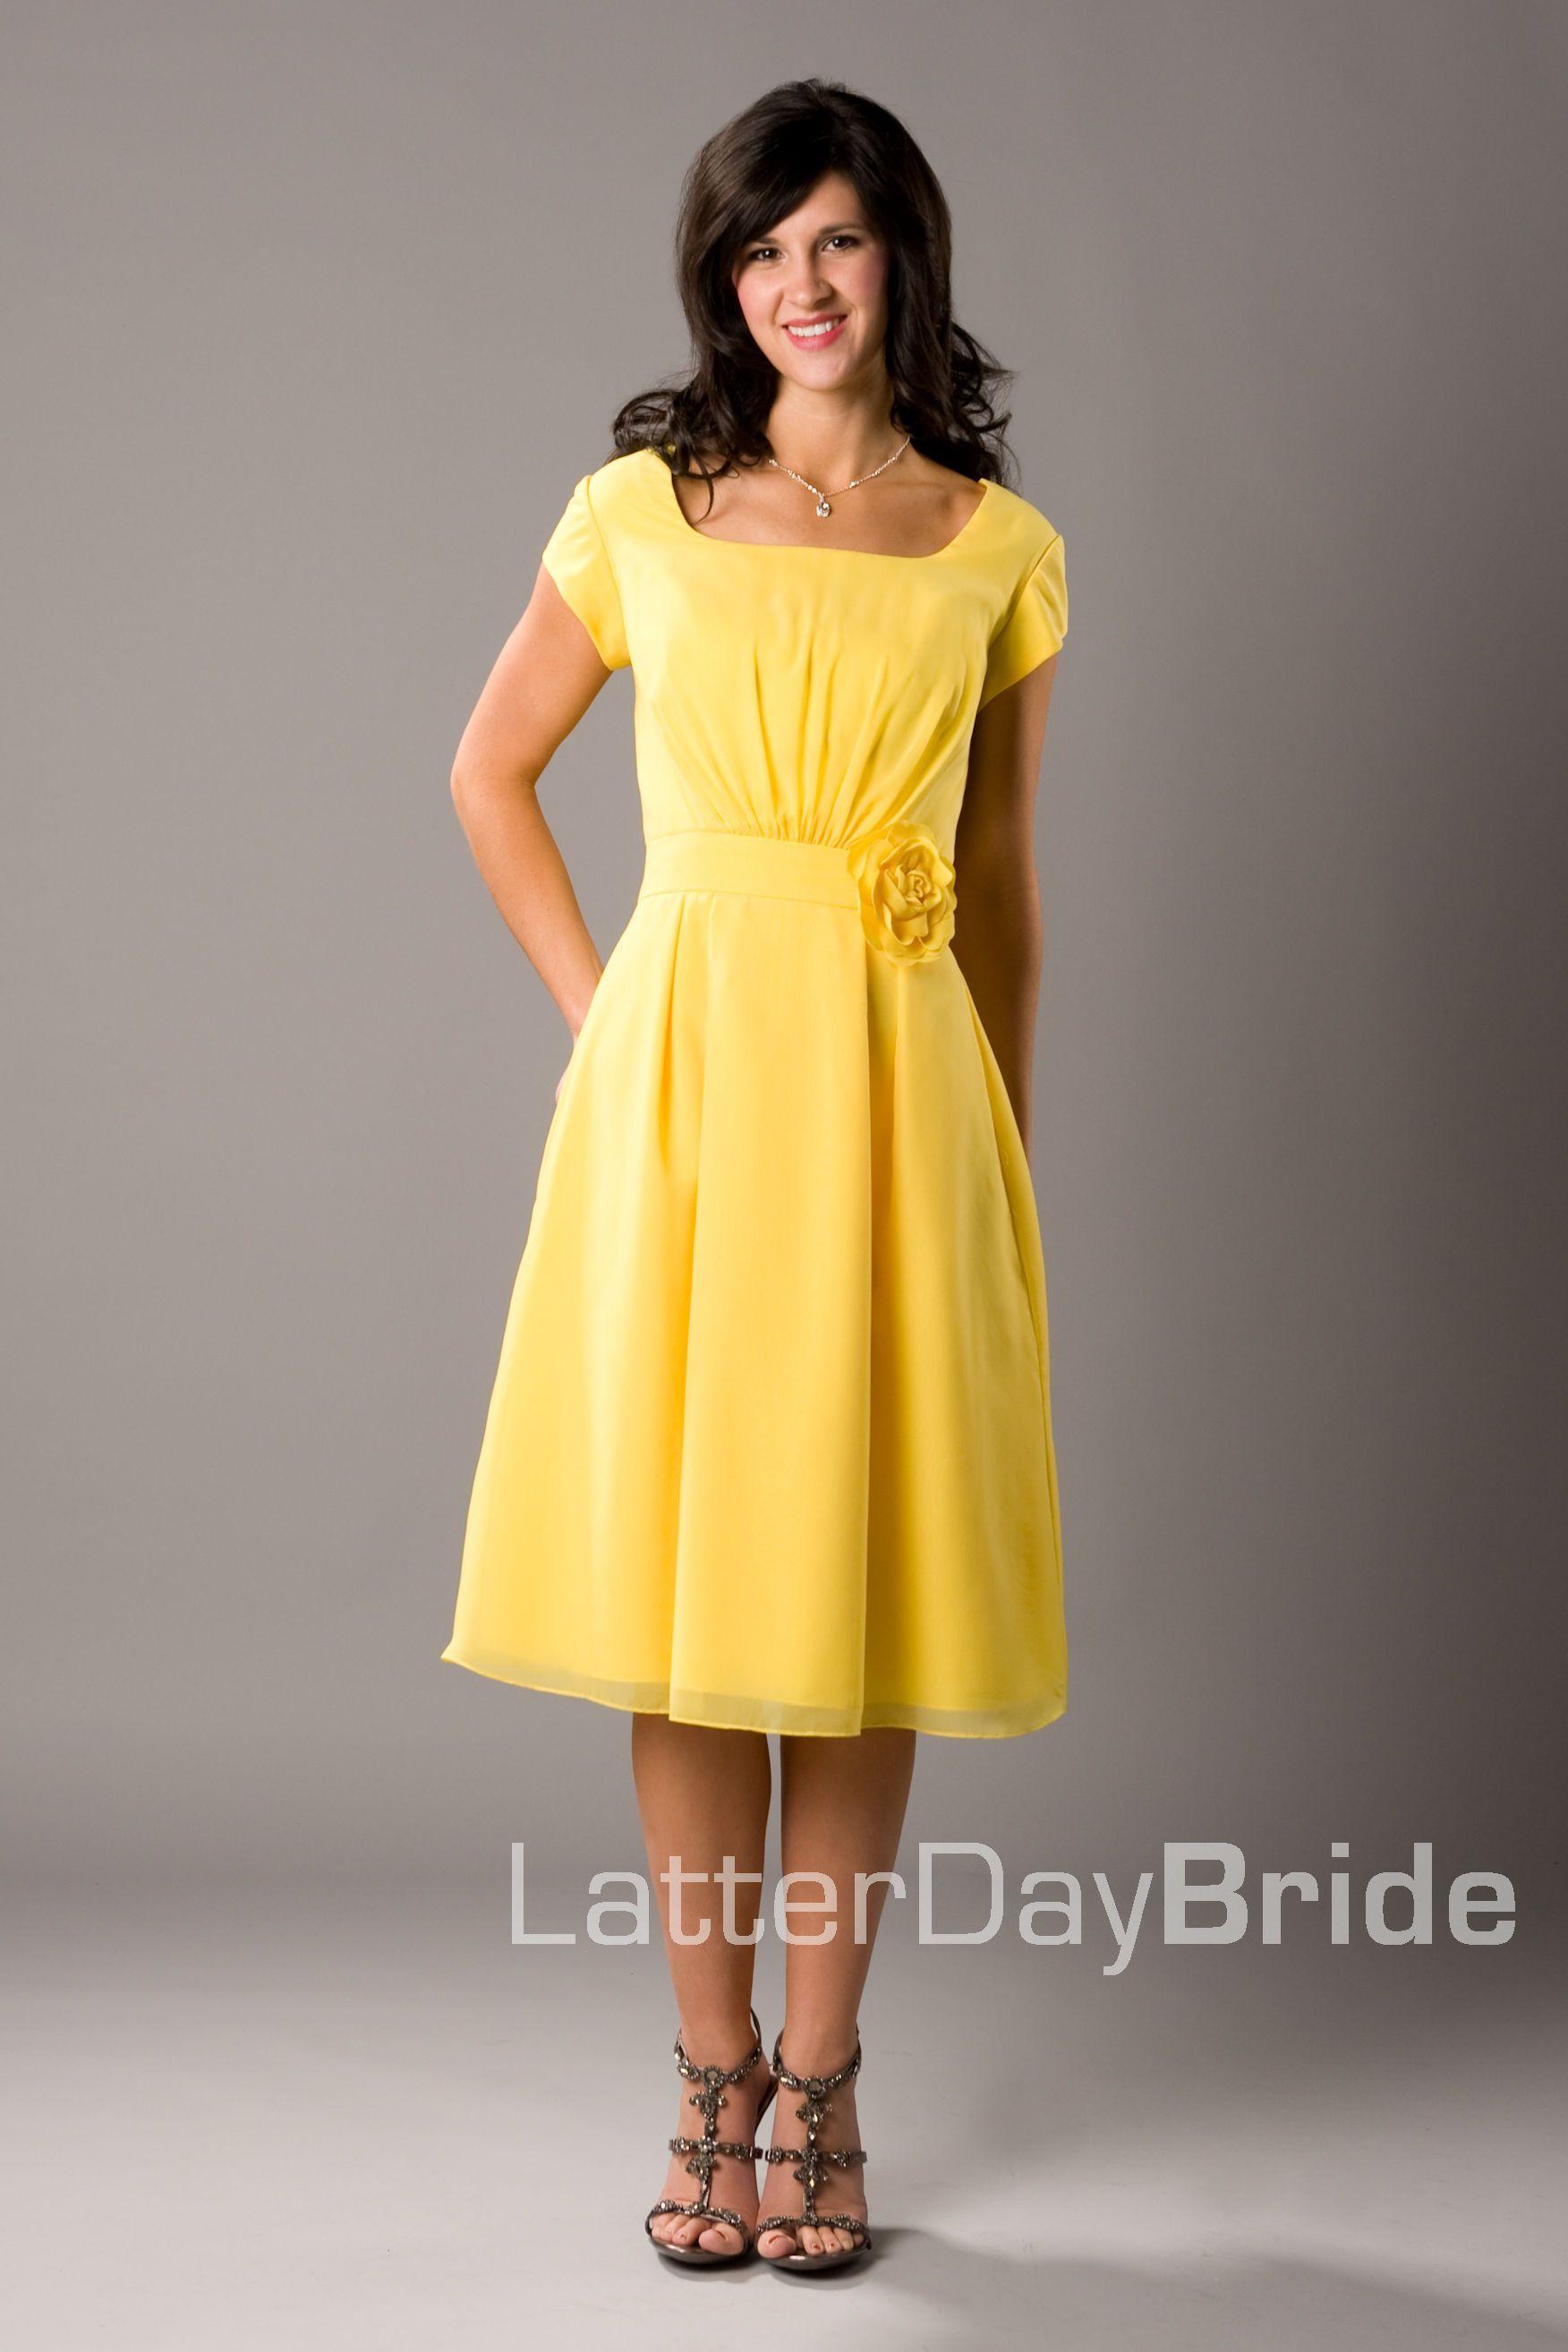 Black dress yellow sash - Yellow Bridesmaid Dress Latter Day Bride